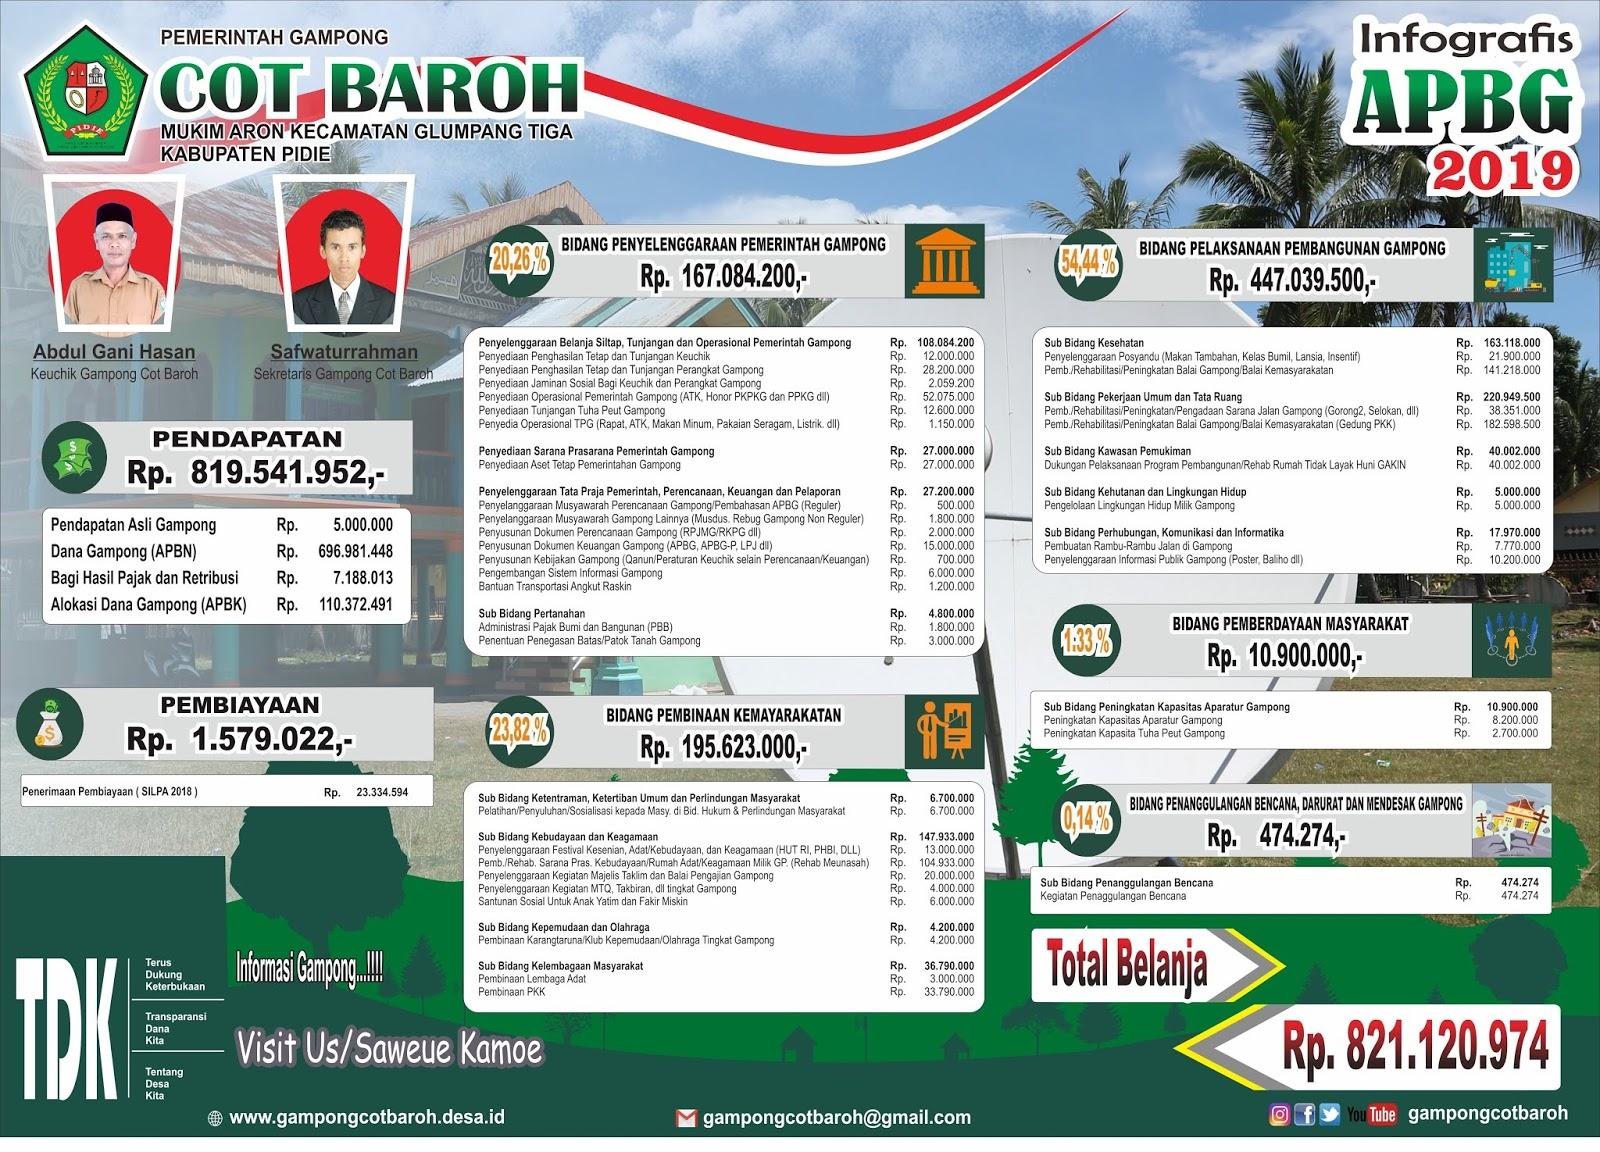 Infografis APBG Cot Baroh Ukuran 120 X 180 CM